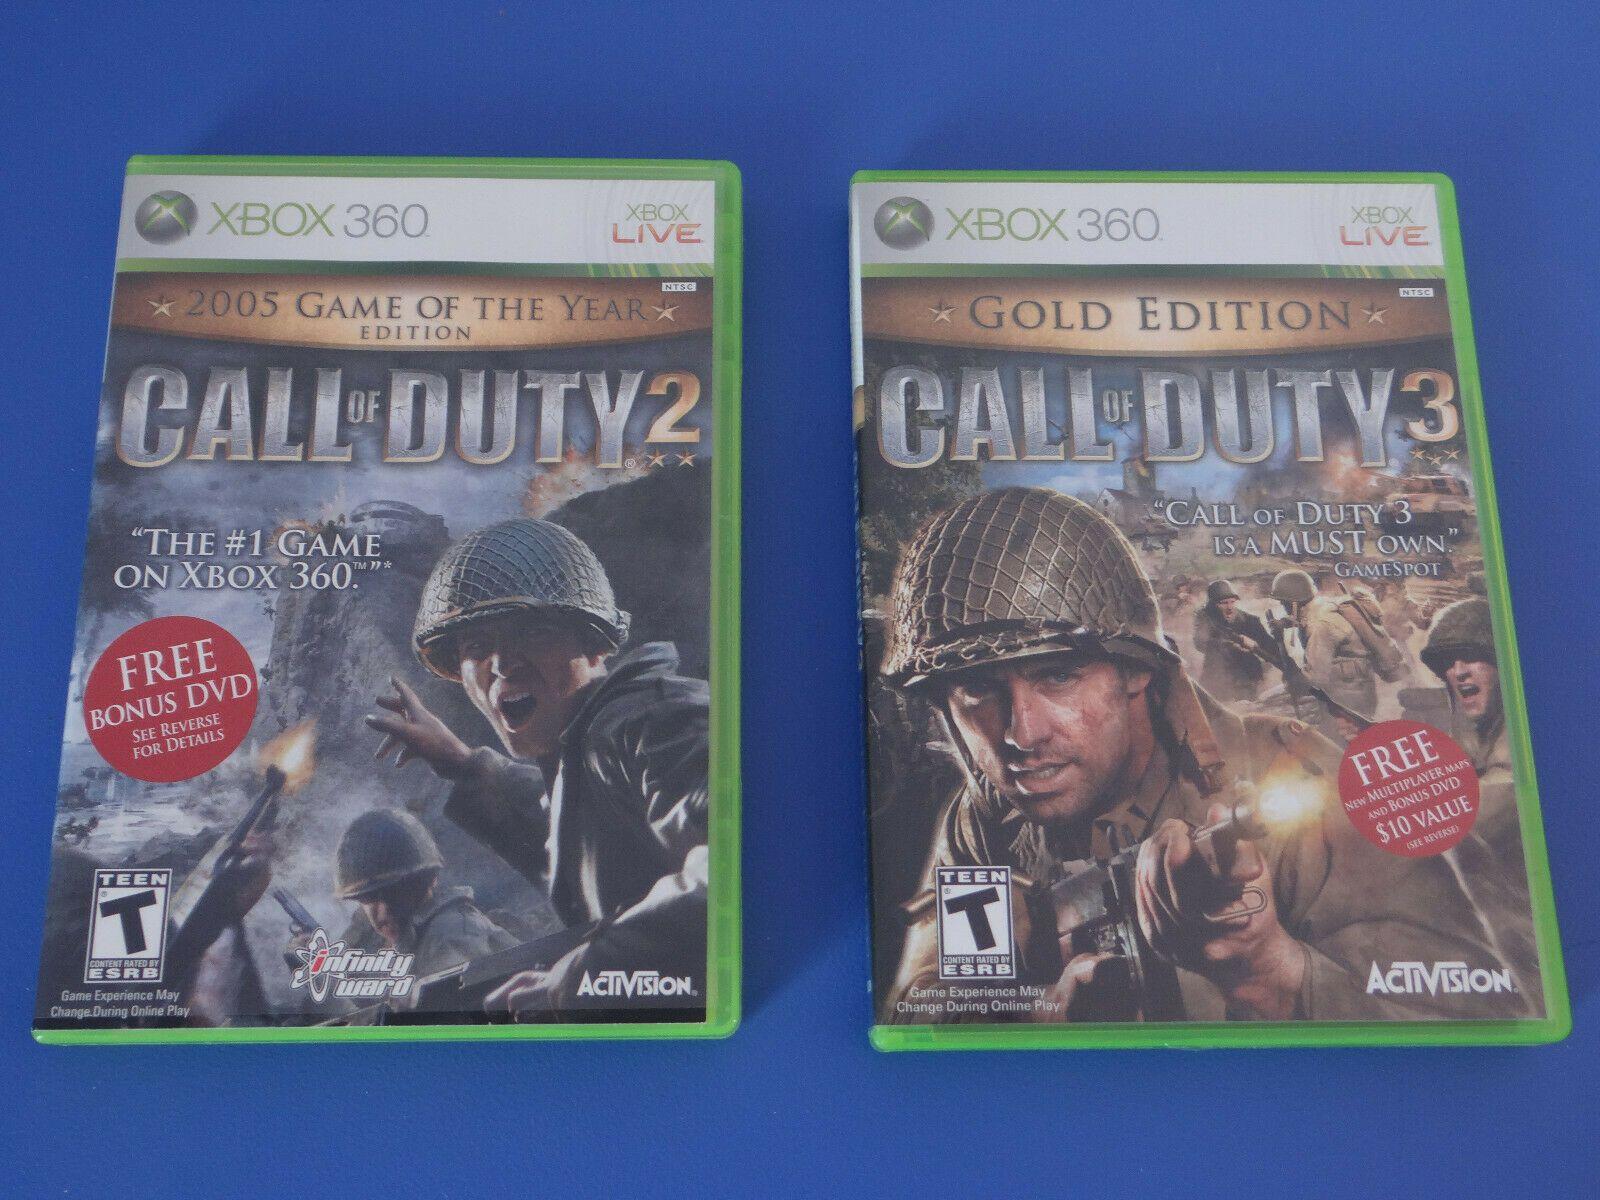 Call Of Duty 2 Goty Call Of Duty 3 Gold Edition Xbox 360 Ideas Of Call Of Duty Callofduty In 2020 Call Of Duty Xbox 360 Xbox